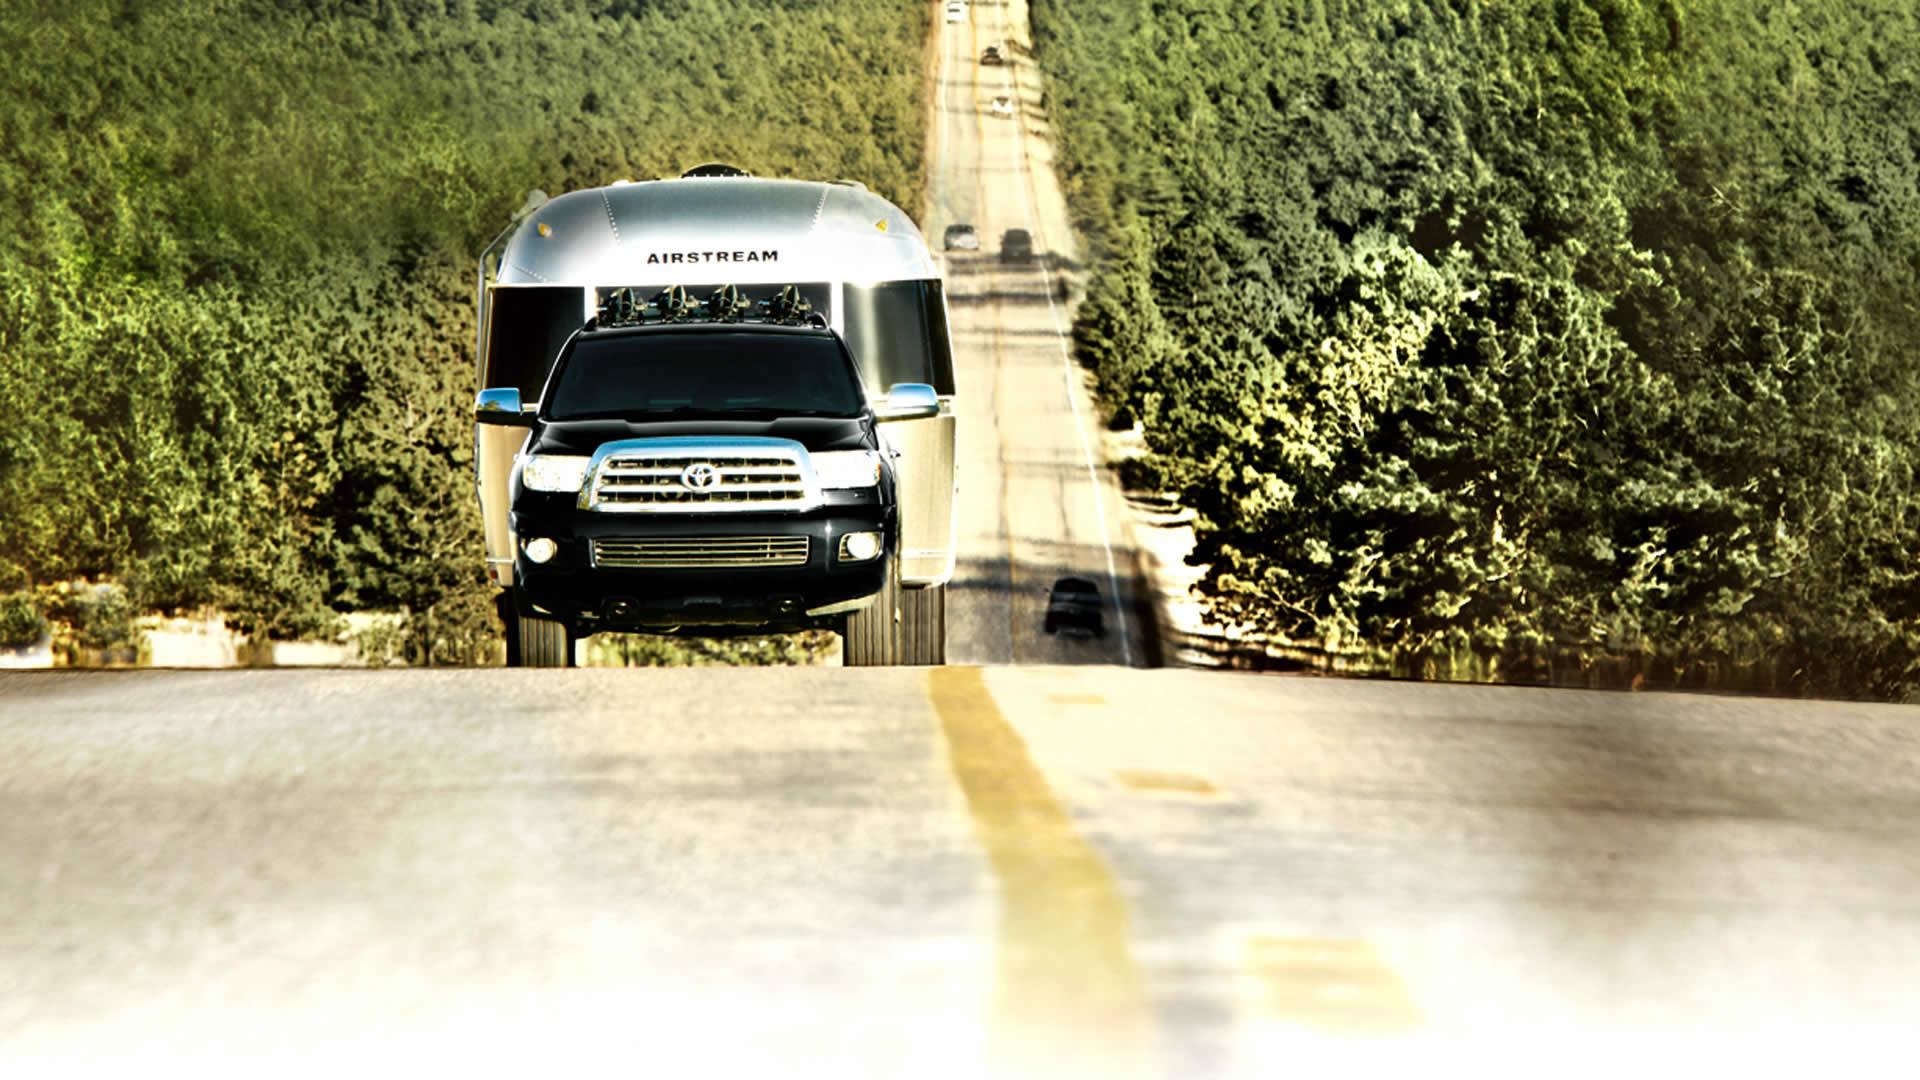 2016 Toyota Sequoia tow